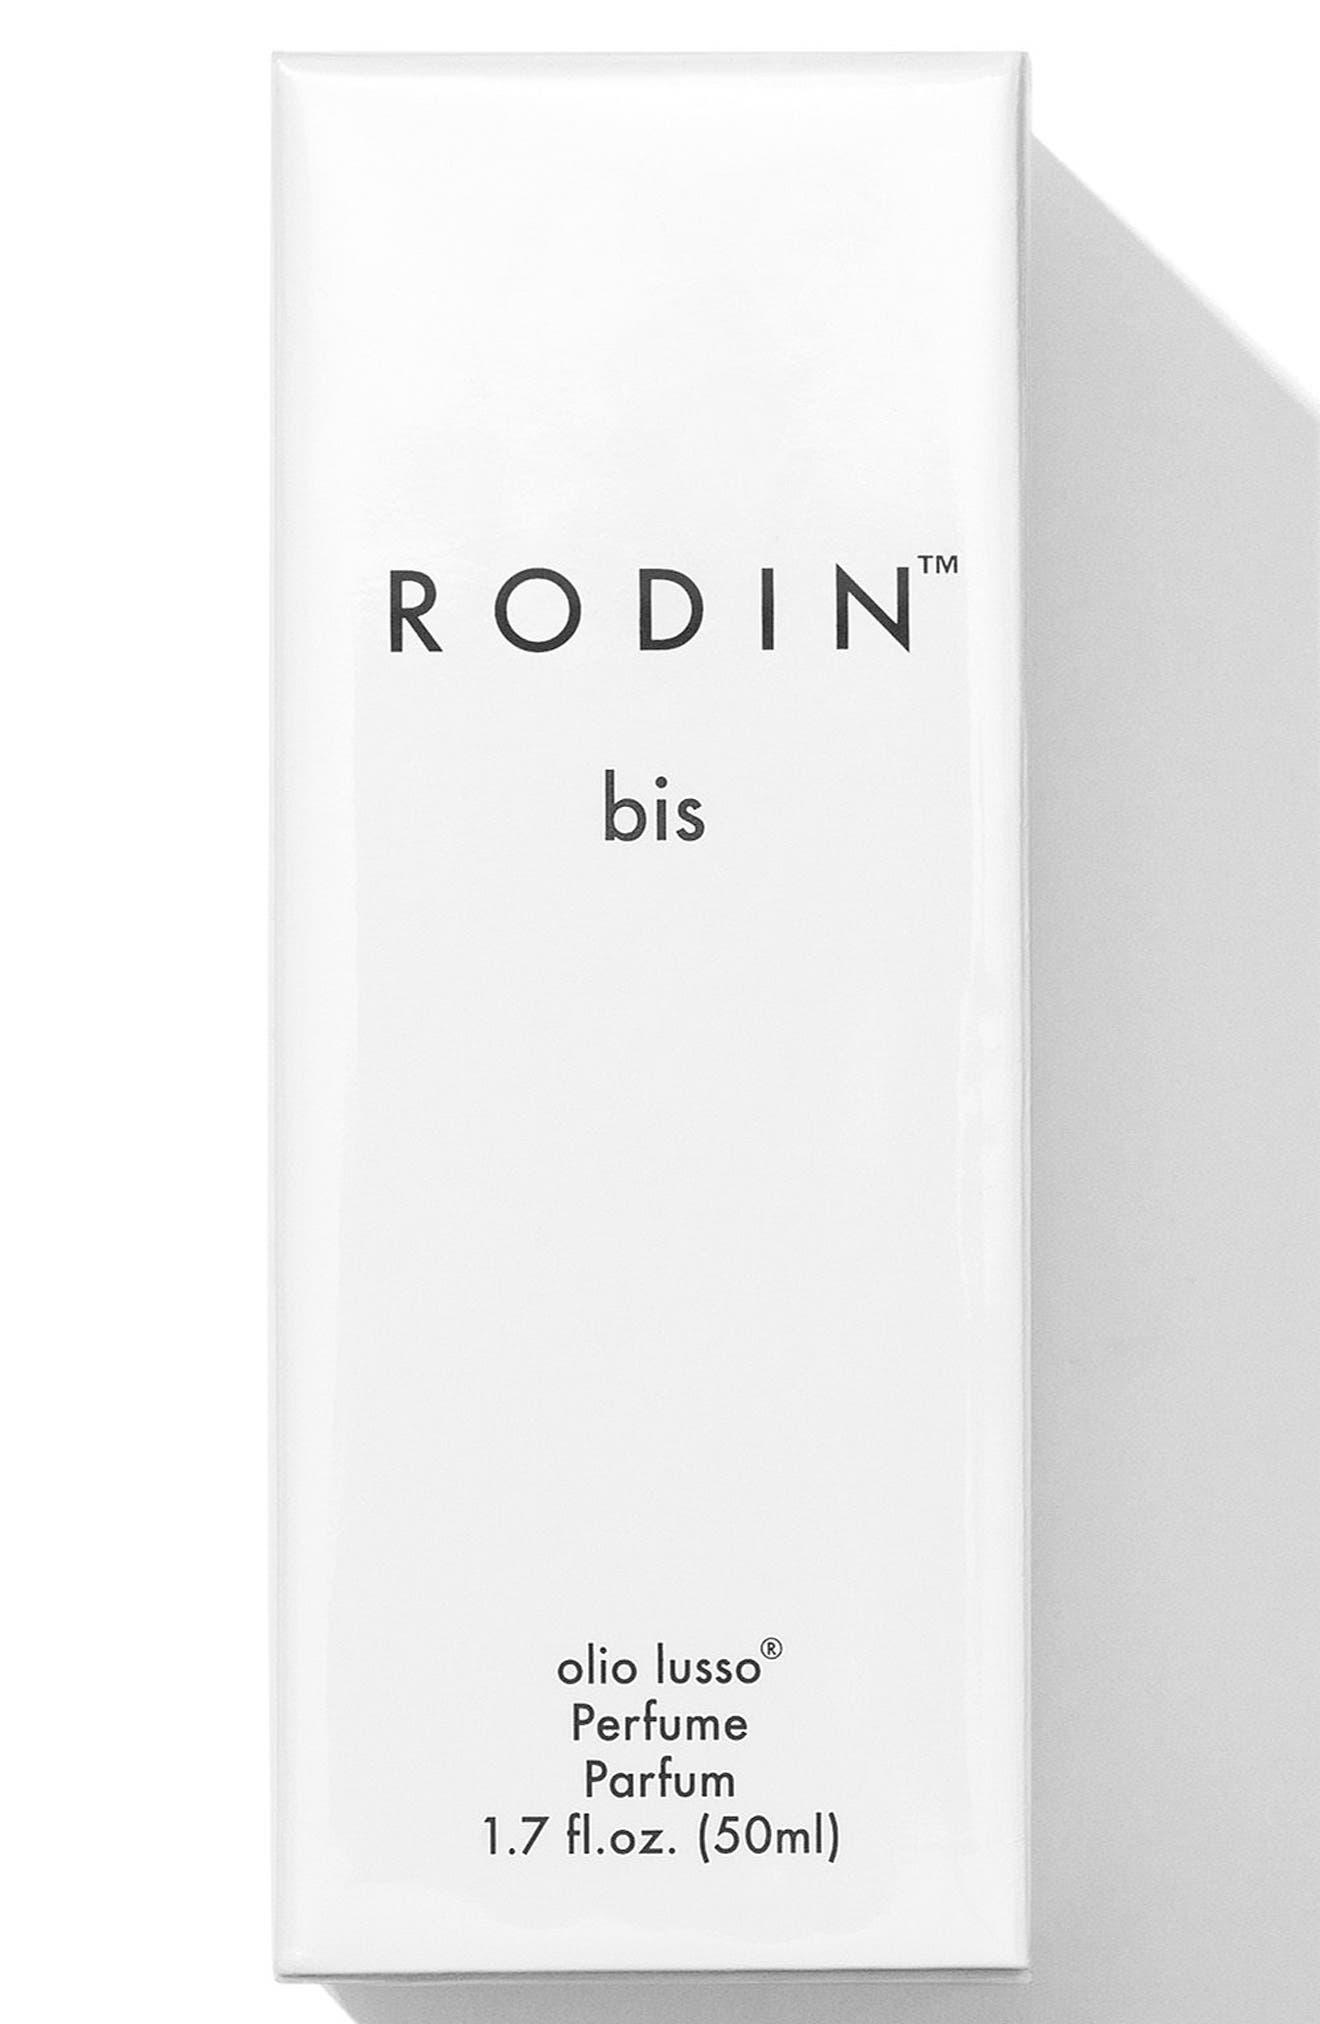 RODIN OLIO LUSSO,                             bis Perfume,                             Alternate thumbnail 2, color,                             NO COLOR